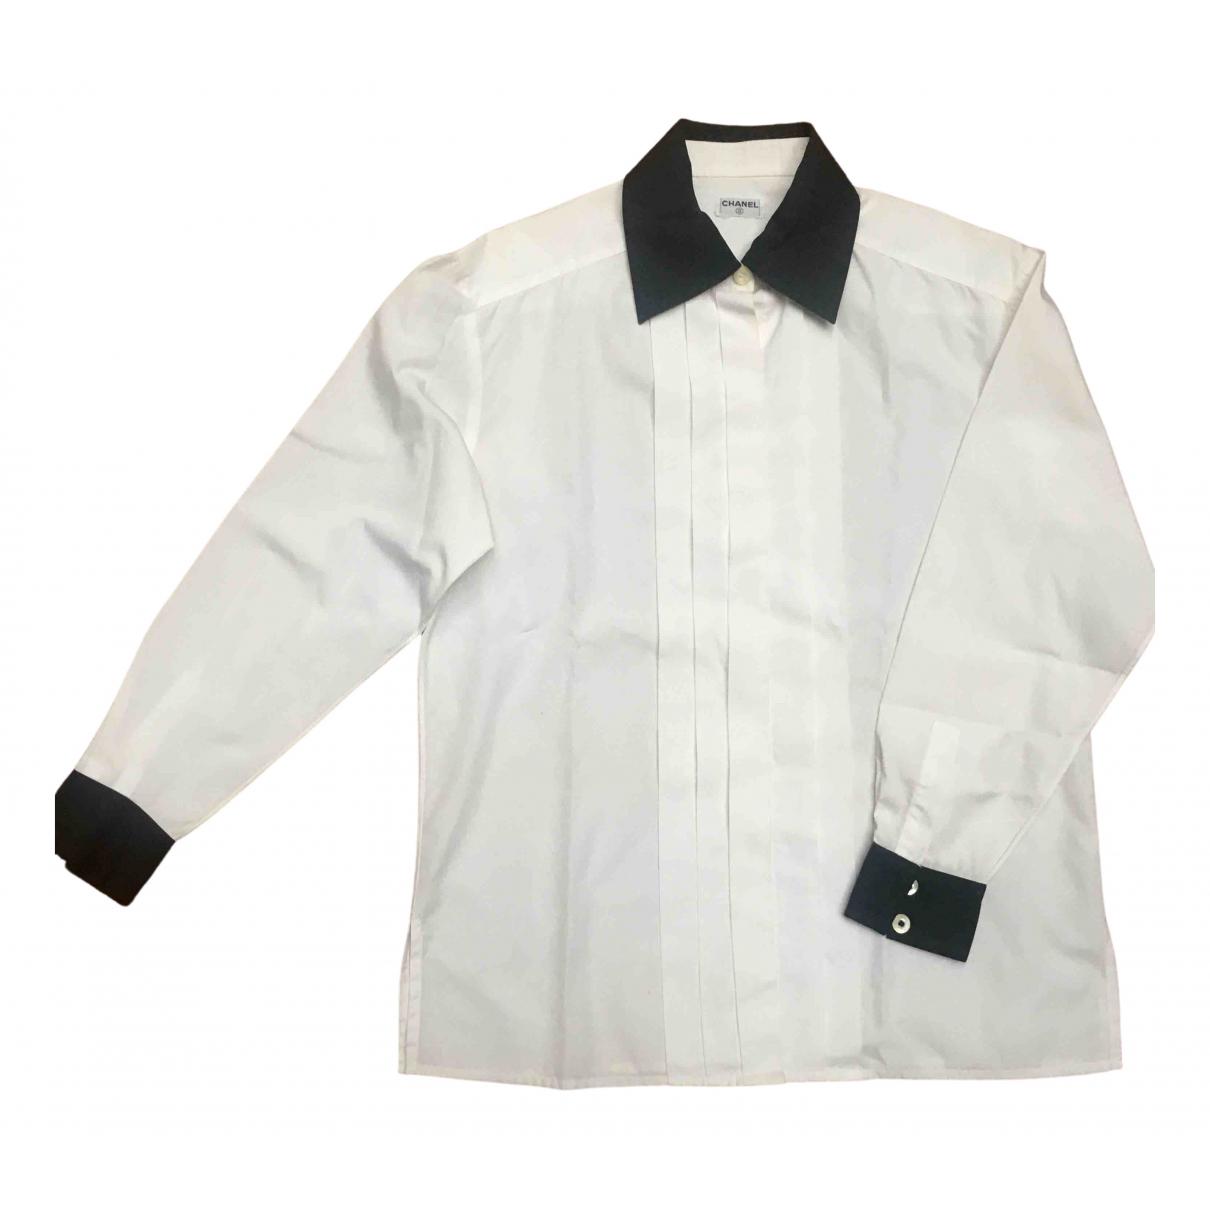 Camisa Chanel